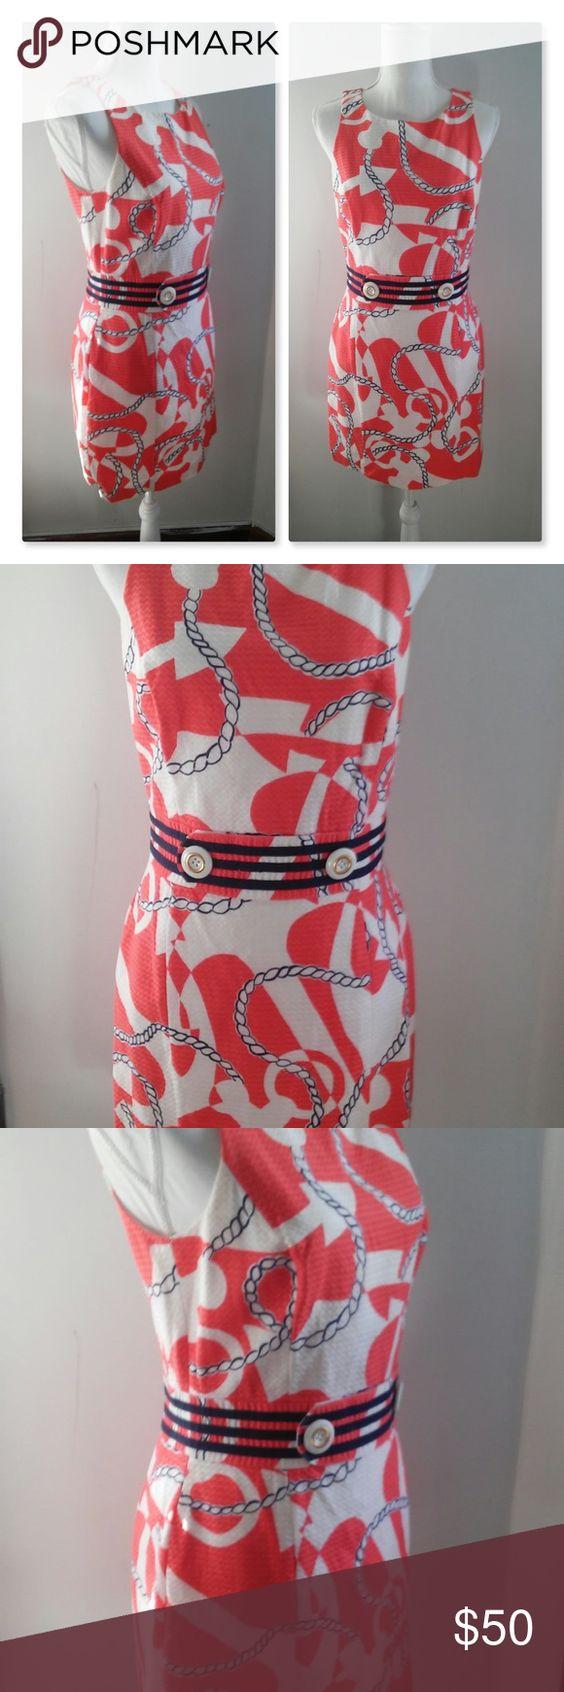 Euc Lilly Pulitzer Booze Cruise Dress Cruise Dress Nautical Dress Lilly Pulitzer